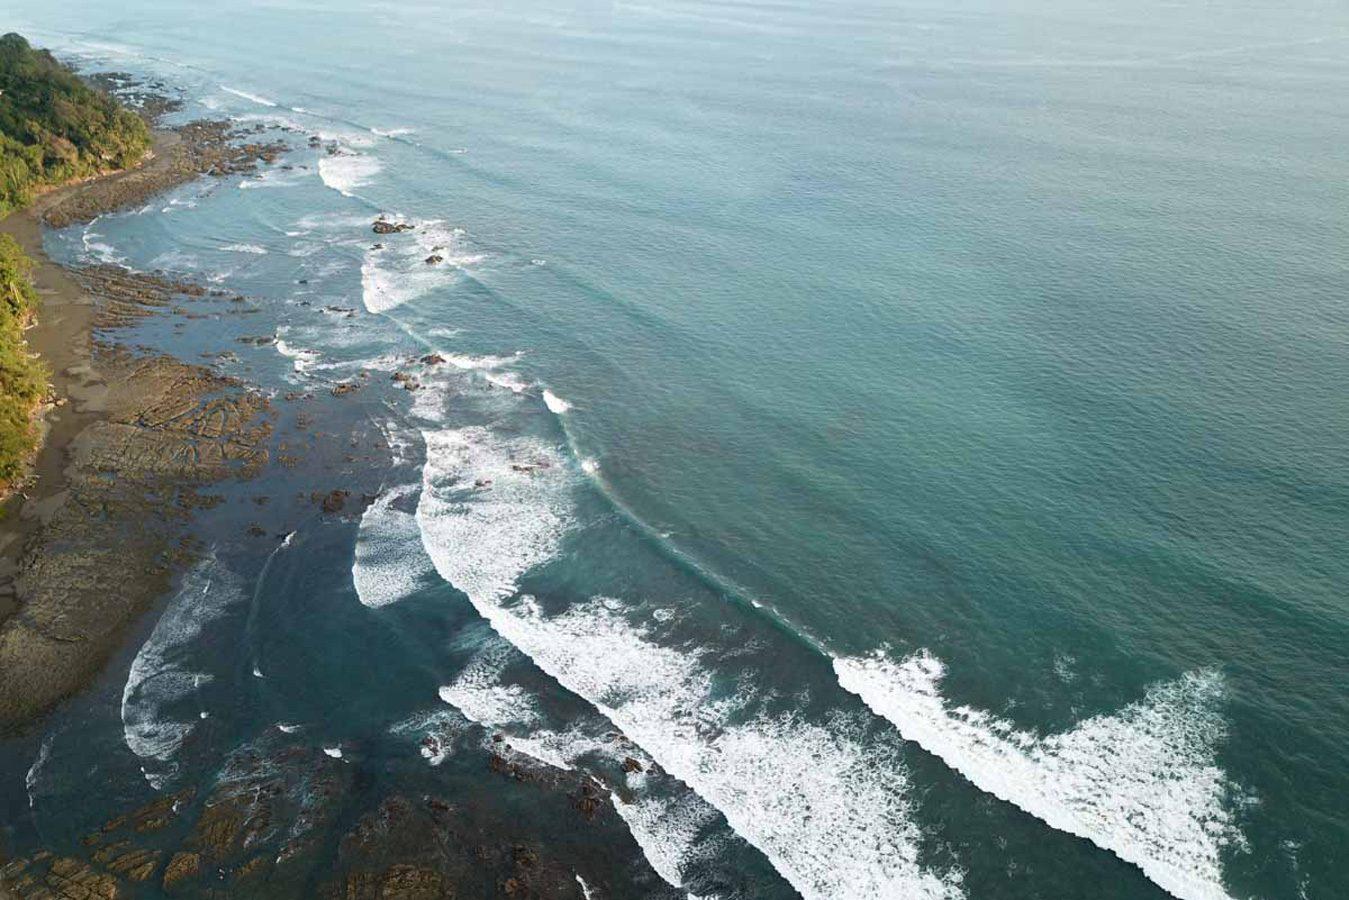 PacificoSURSURprincipalQBL-1.jpg--image